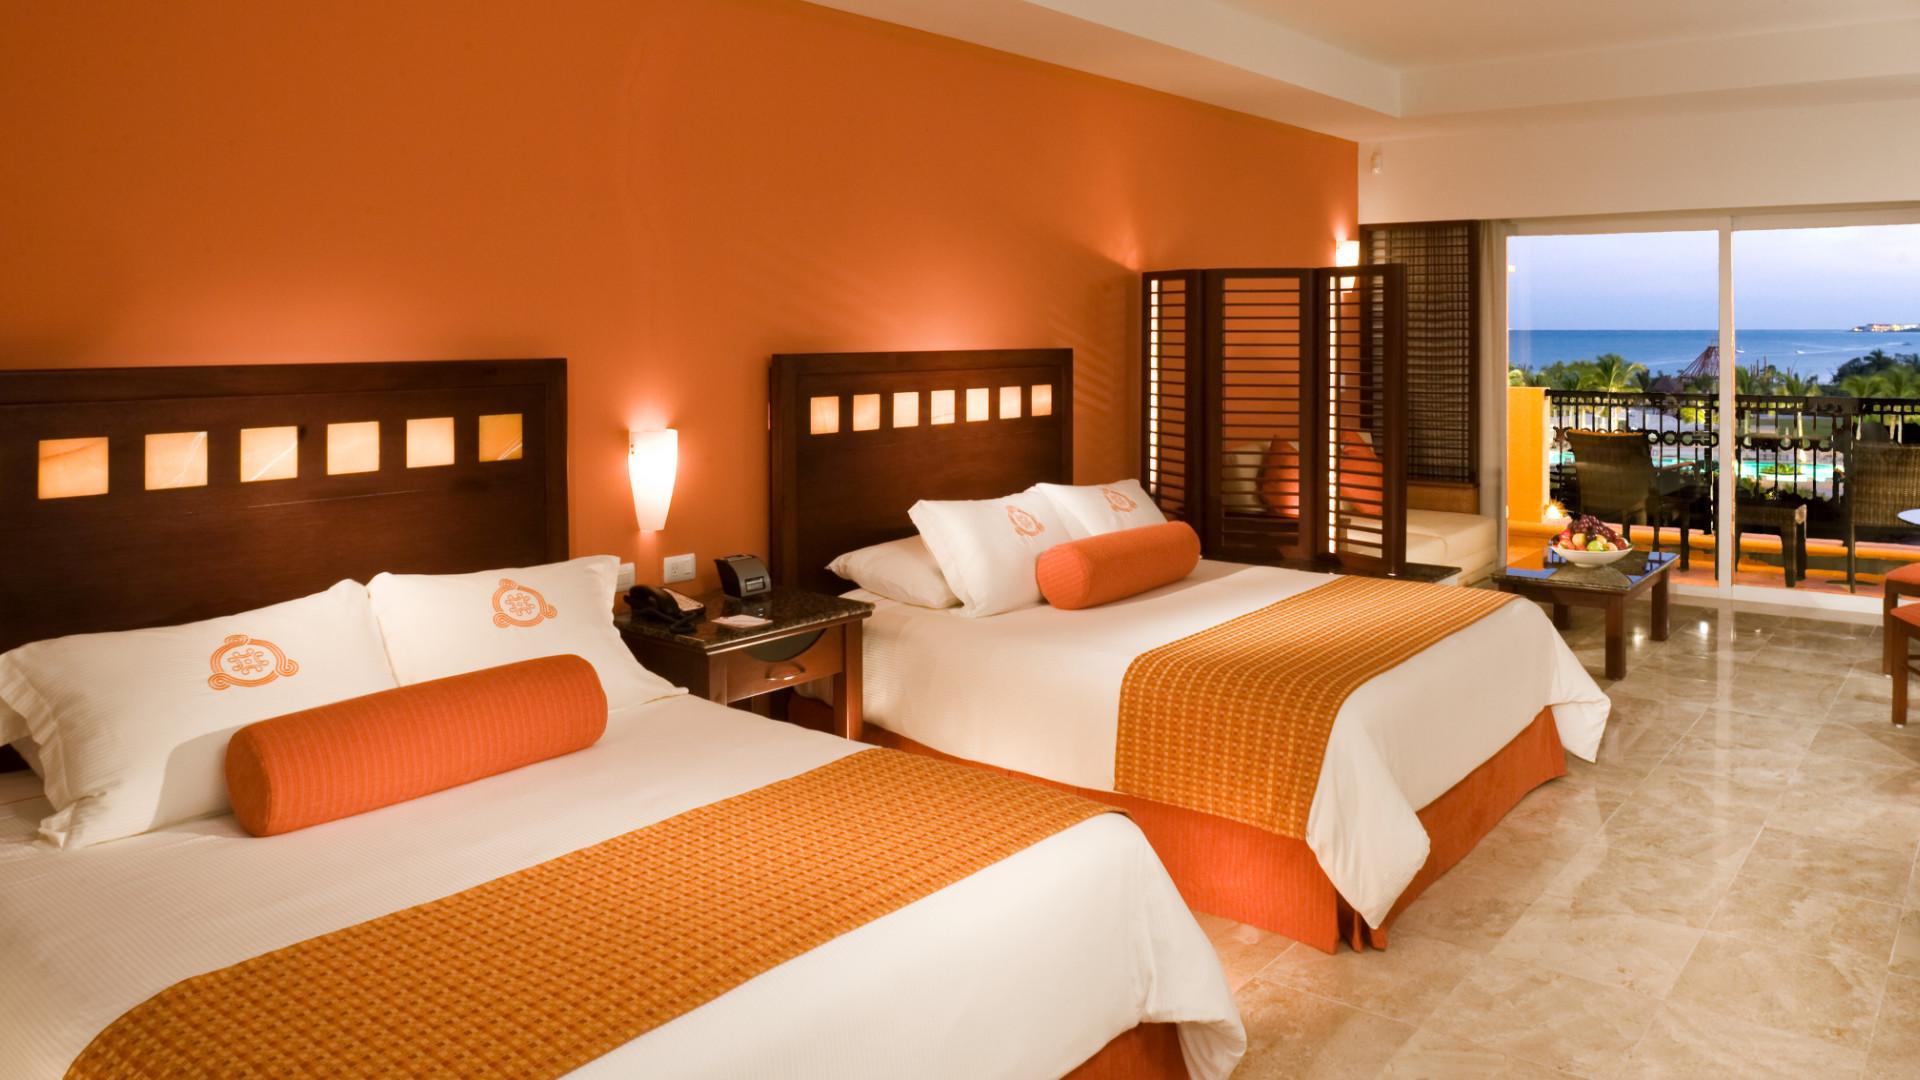 Share Cancun - Hoteles - Hacienda Tres Ríos Resort, Spa & Nature Park | Habitaciones